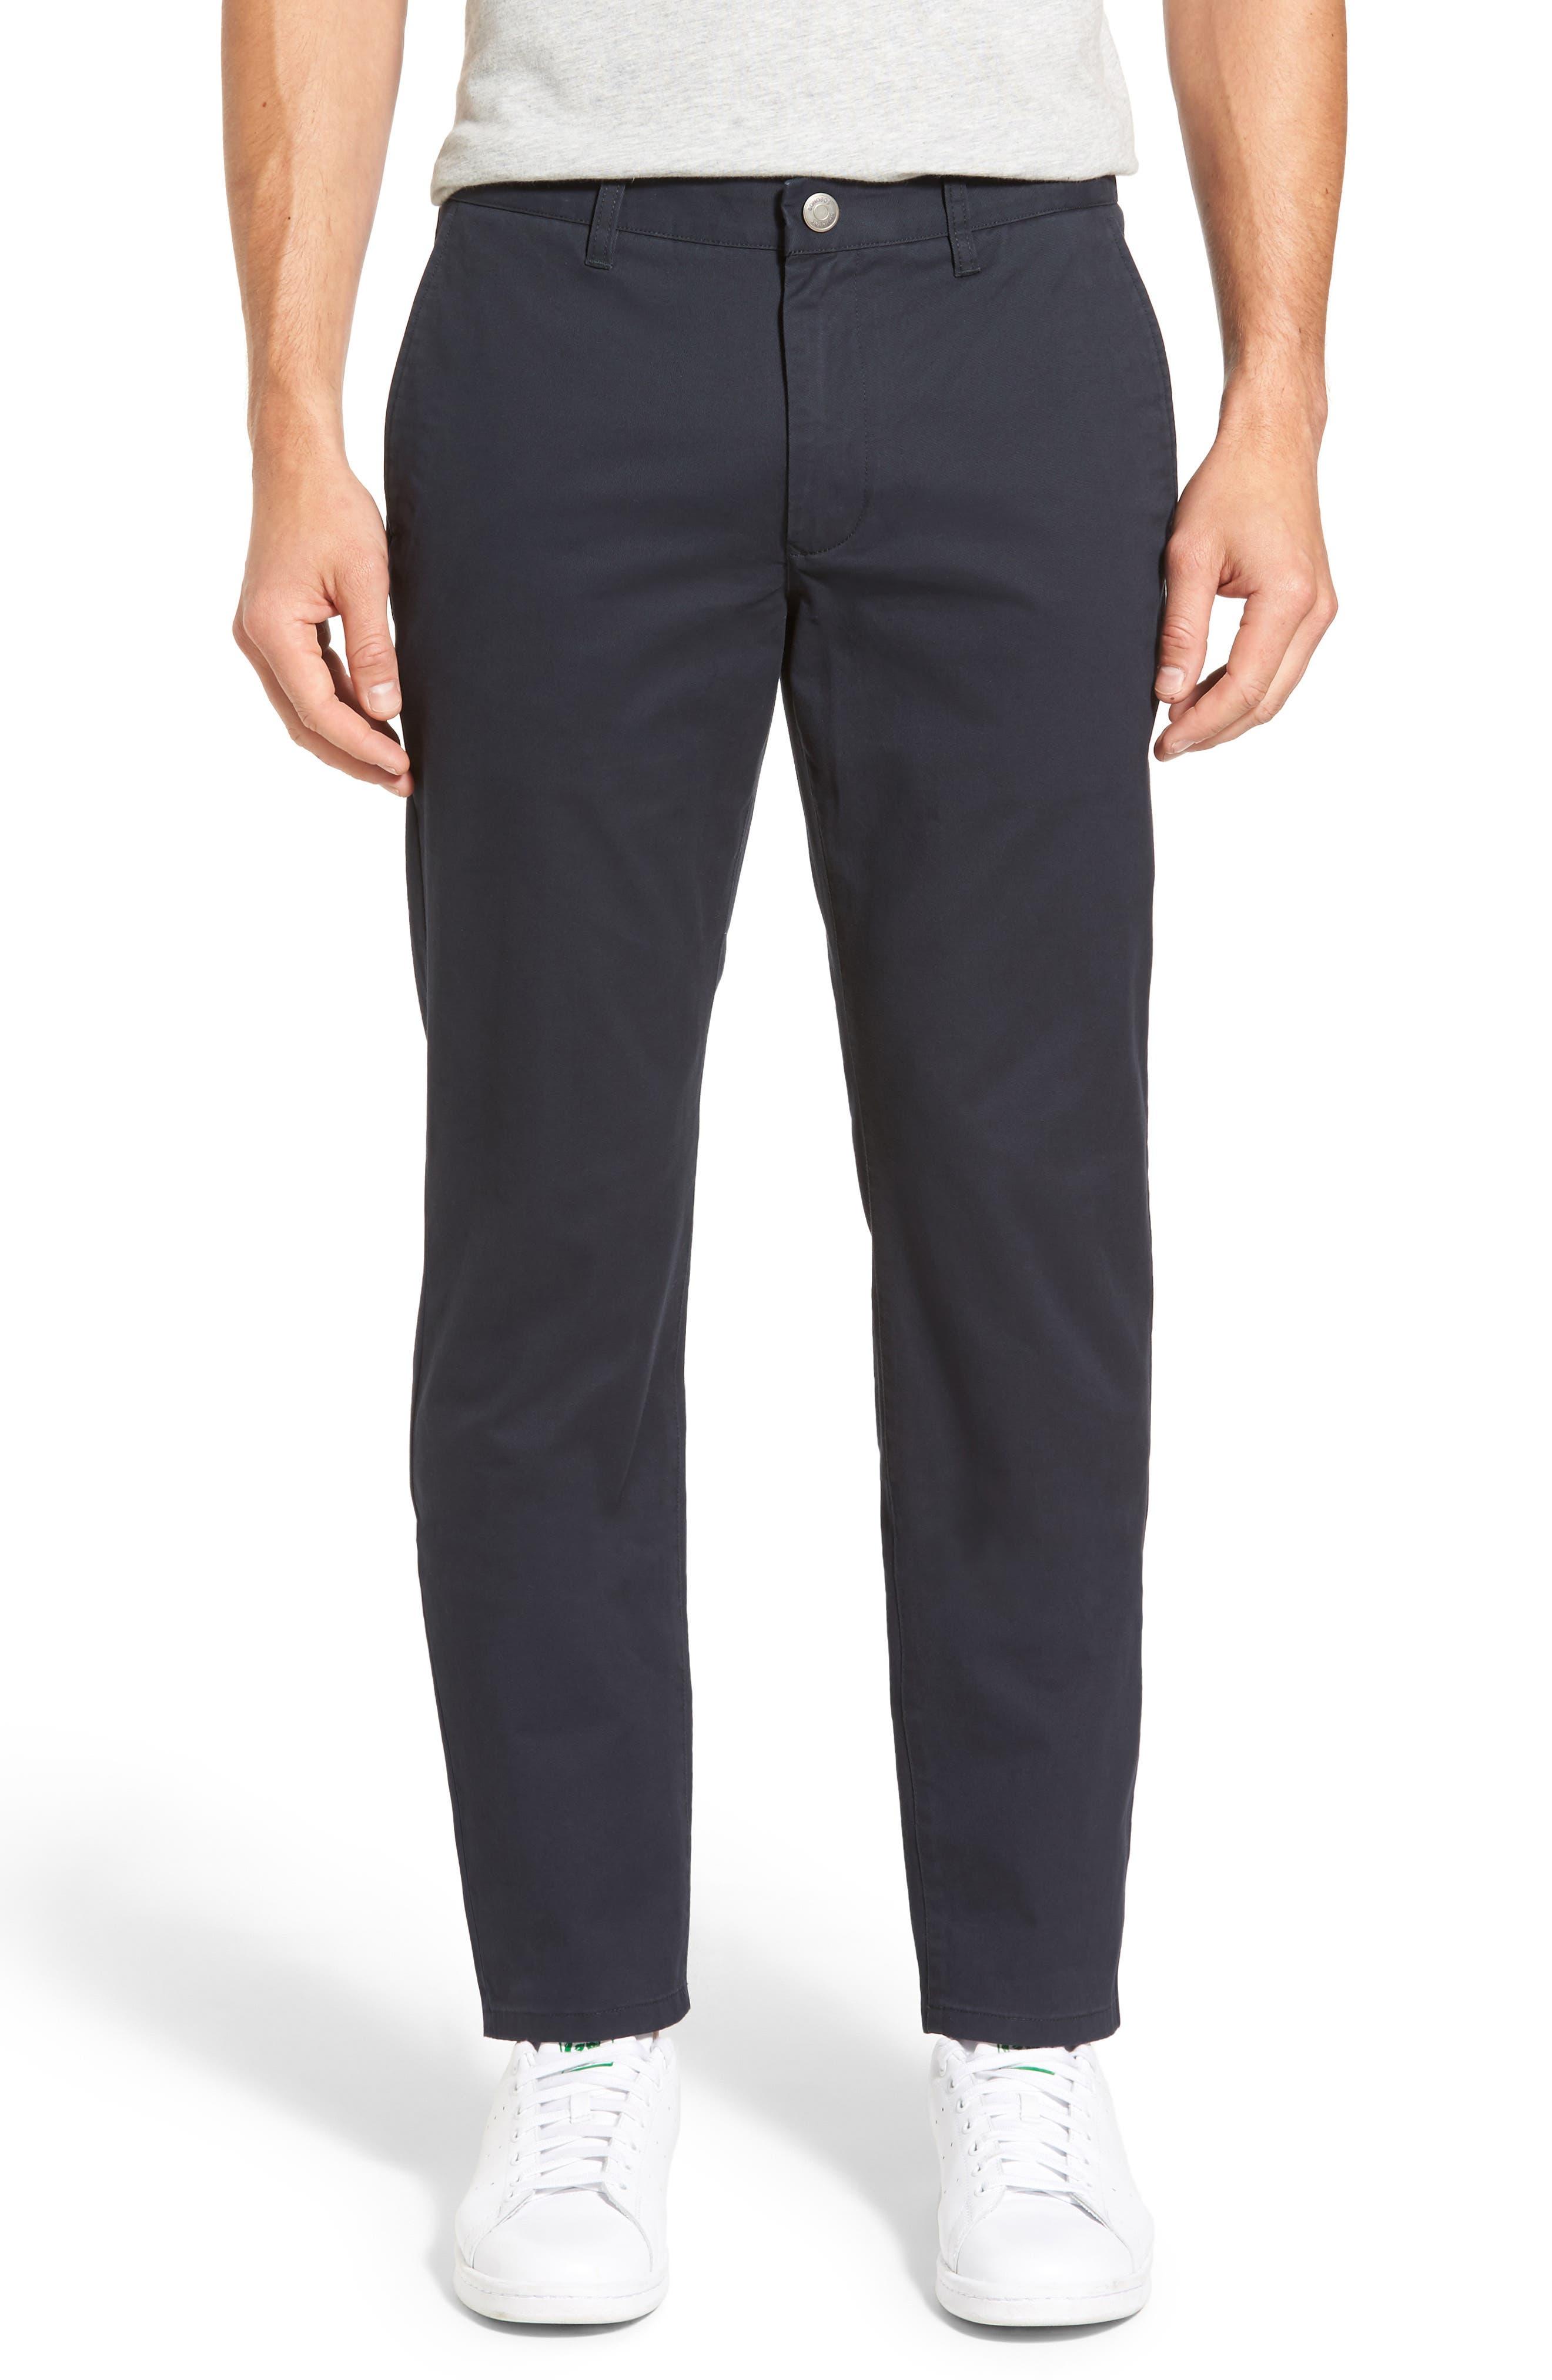 adidas cool 365 uomo's pants 2xl